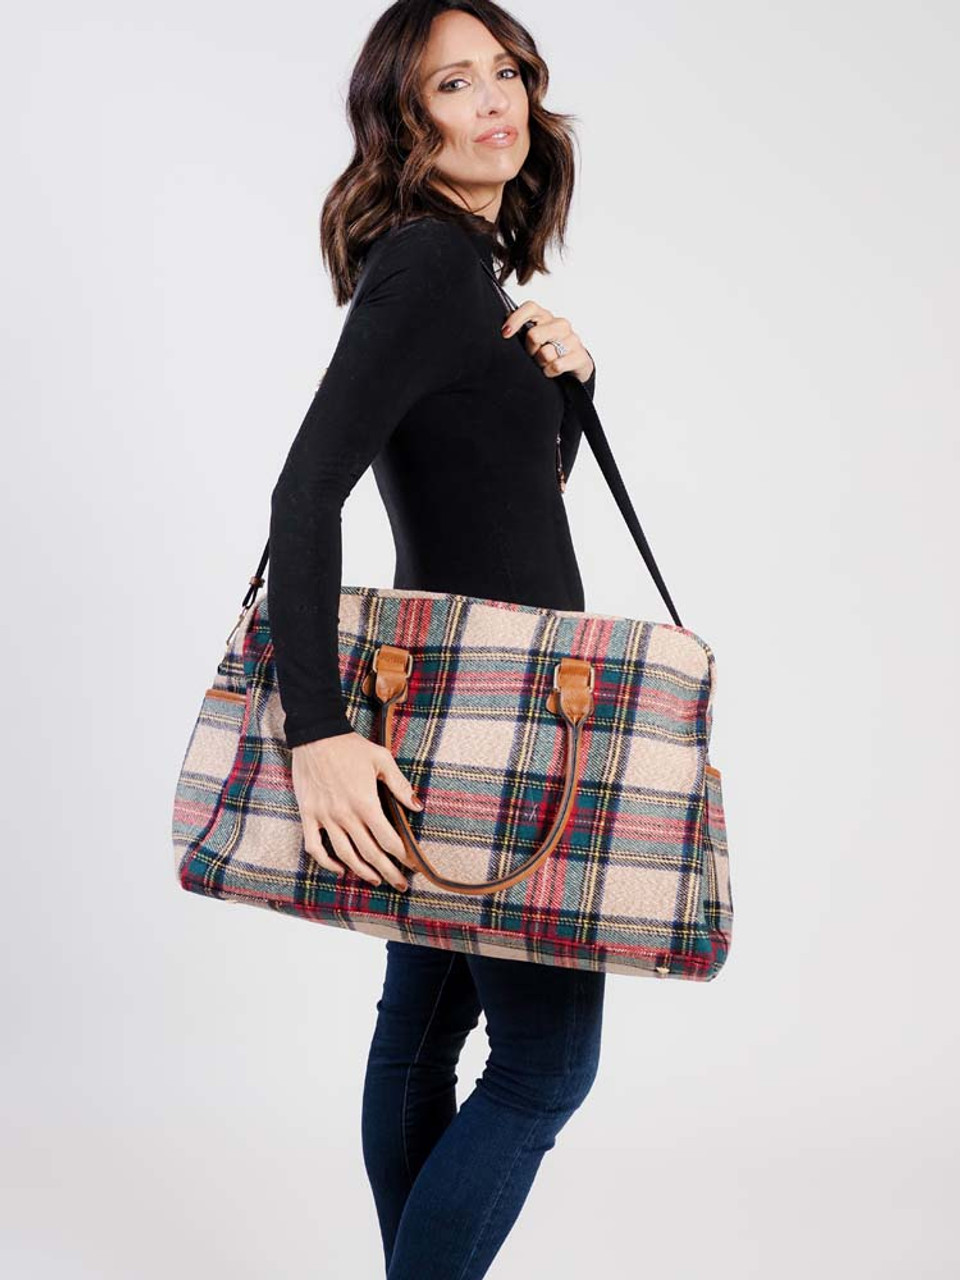 multicolor plaid weekender bag with vegan leather details